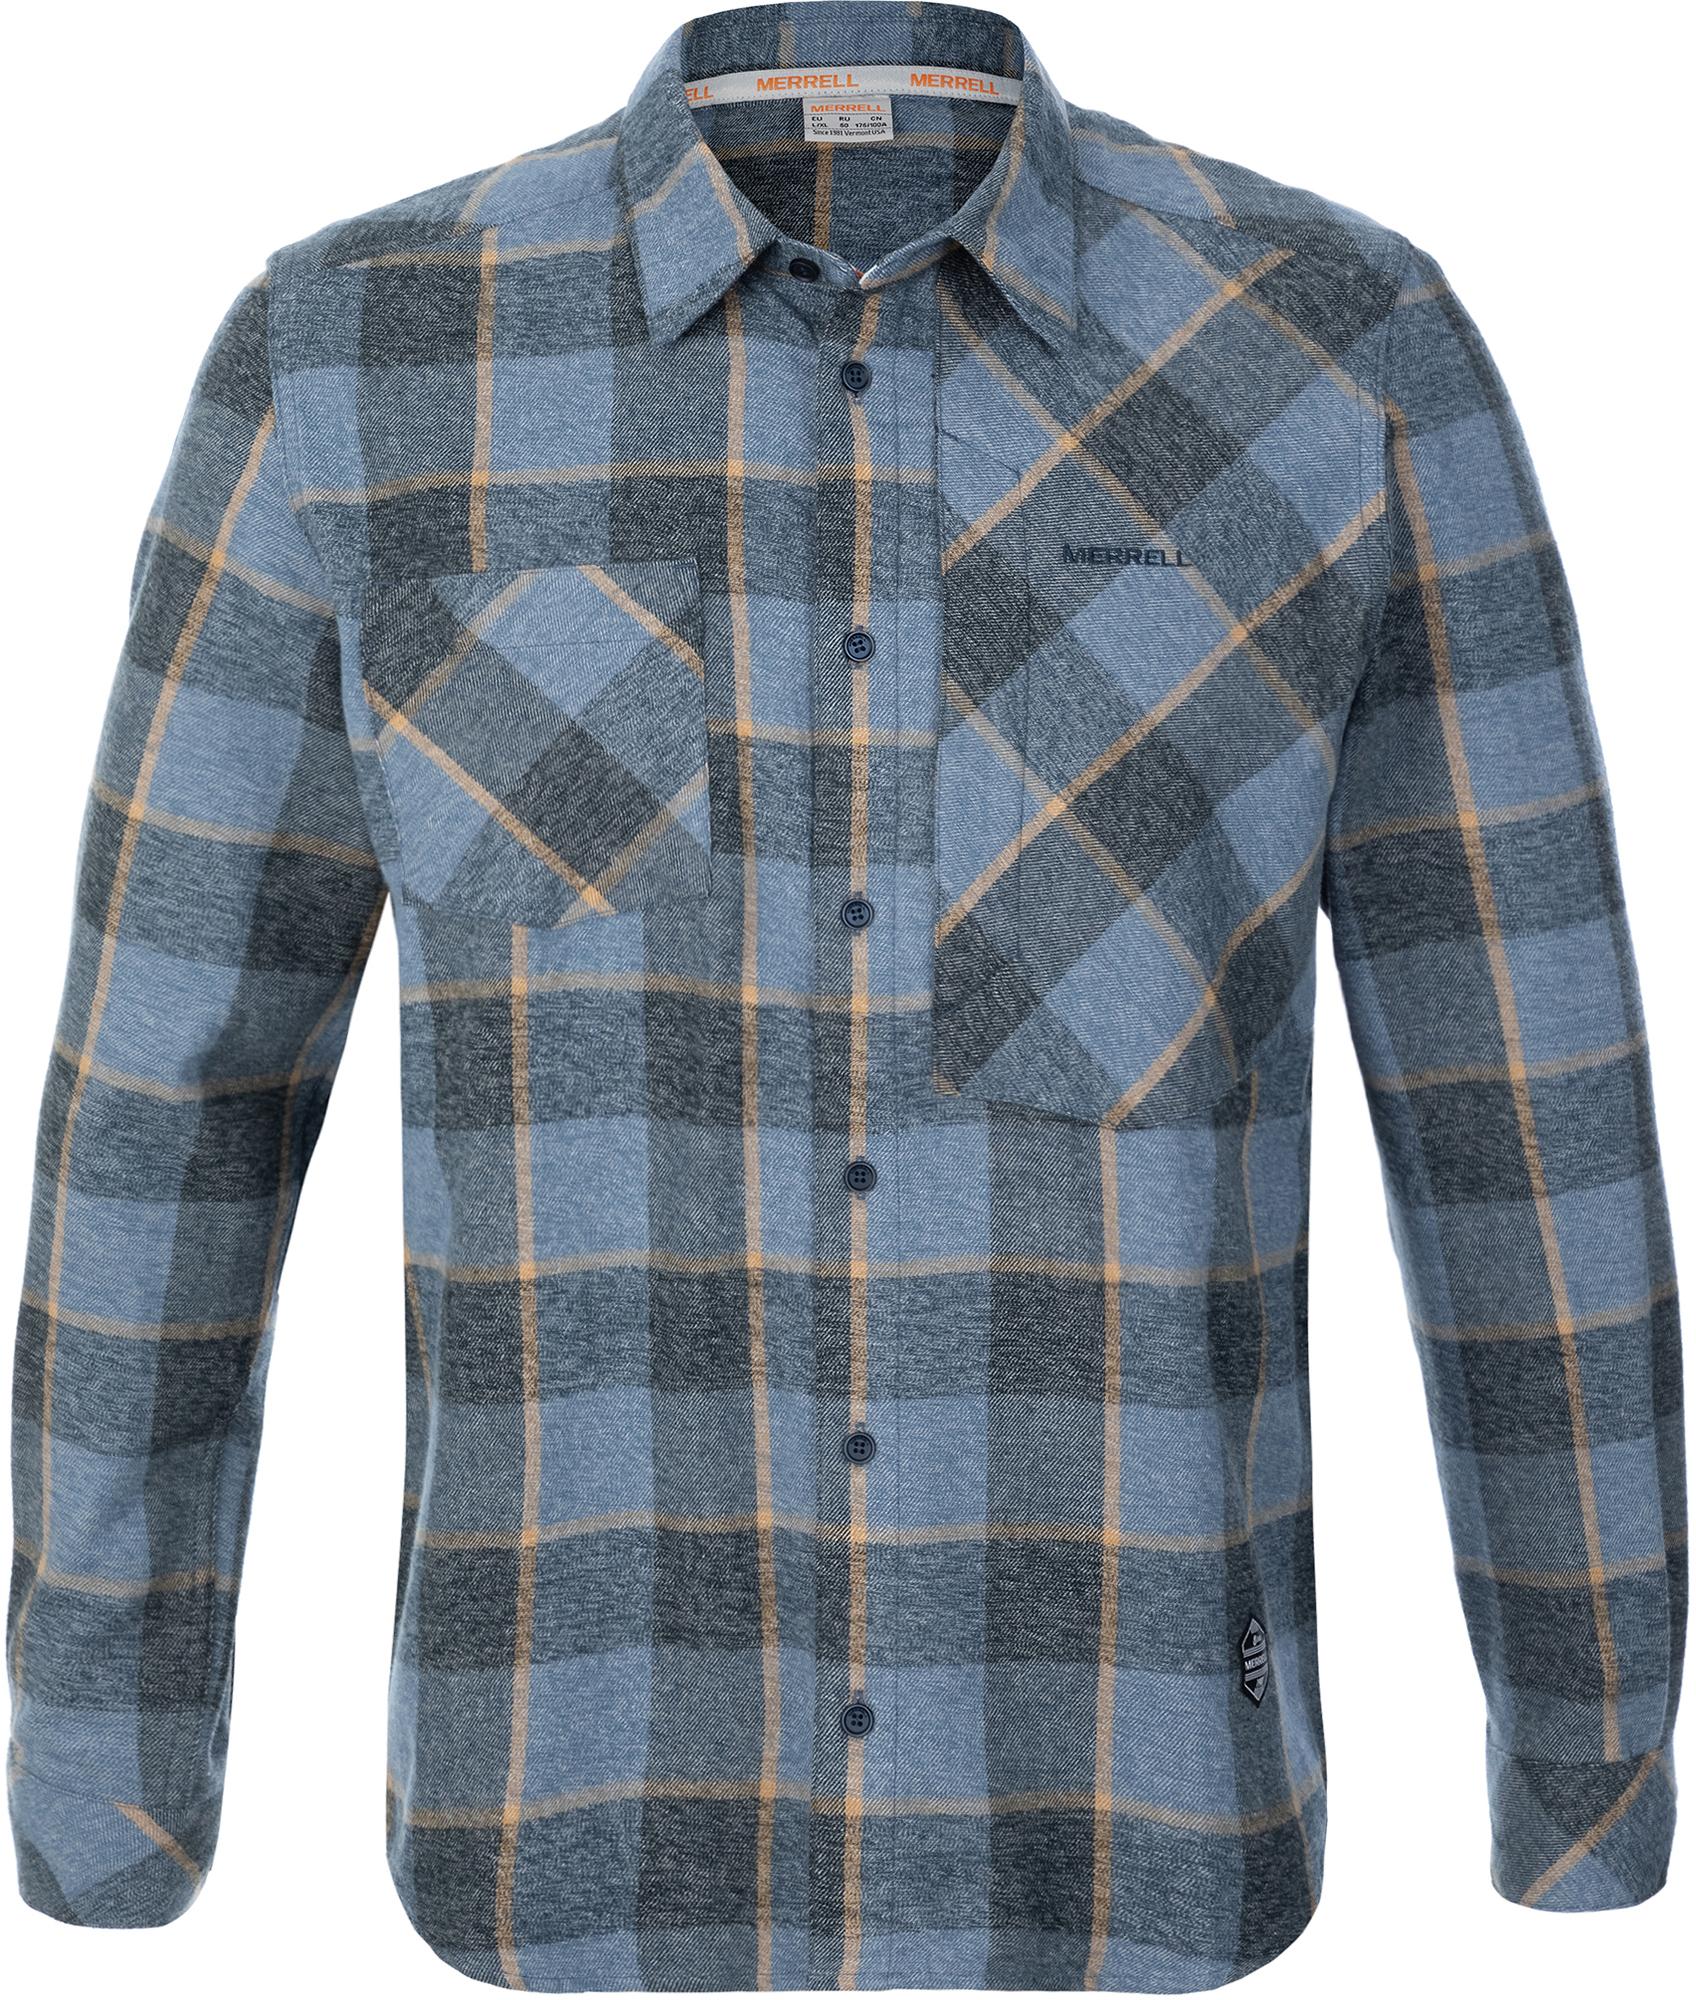 Merrell Рубашка мужская Merrell, размер 54 рубашка мужская jpe 2013 zara